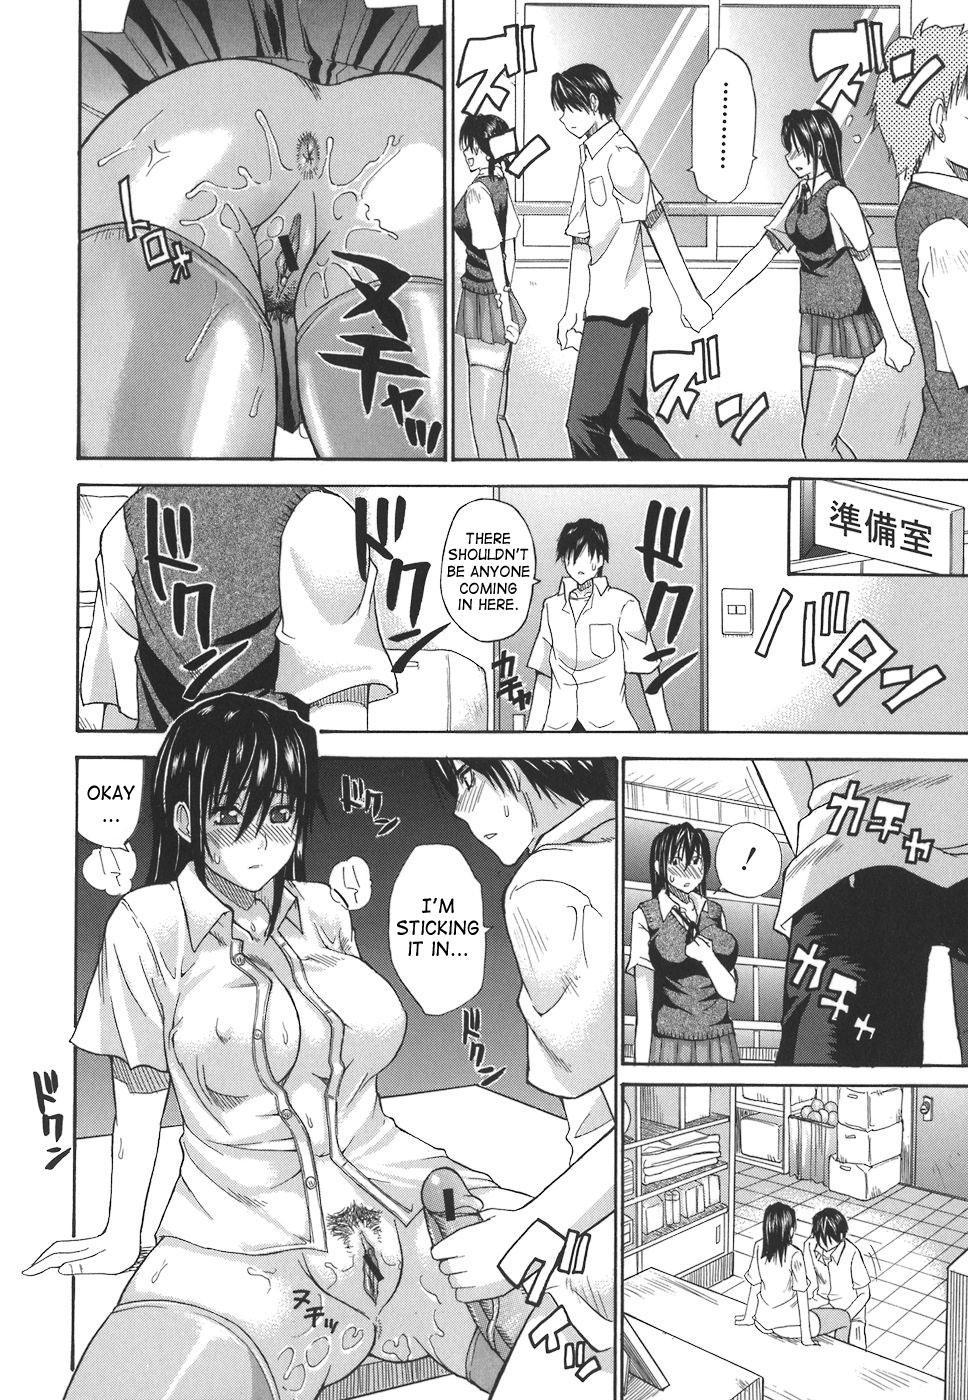 Ichizu na Toriko - A Earnest Captive 96